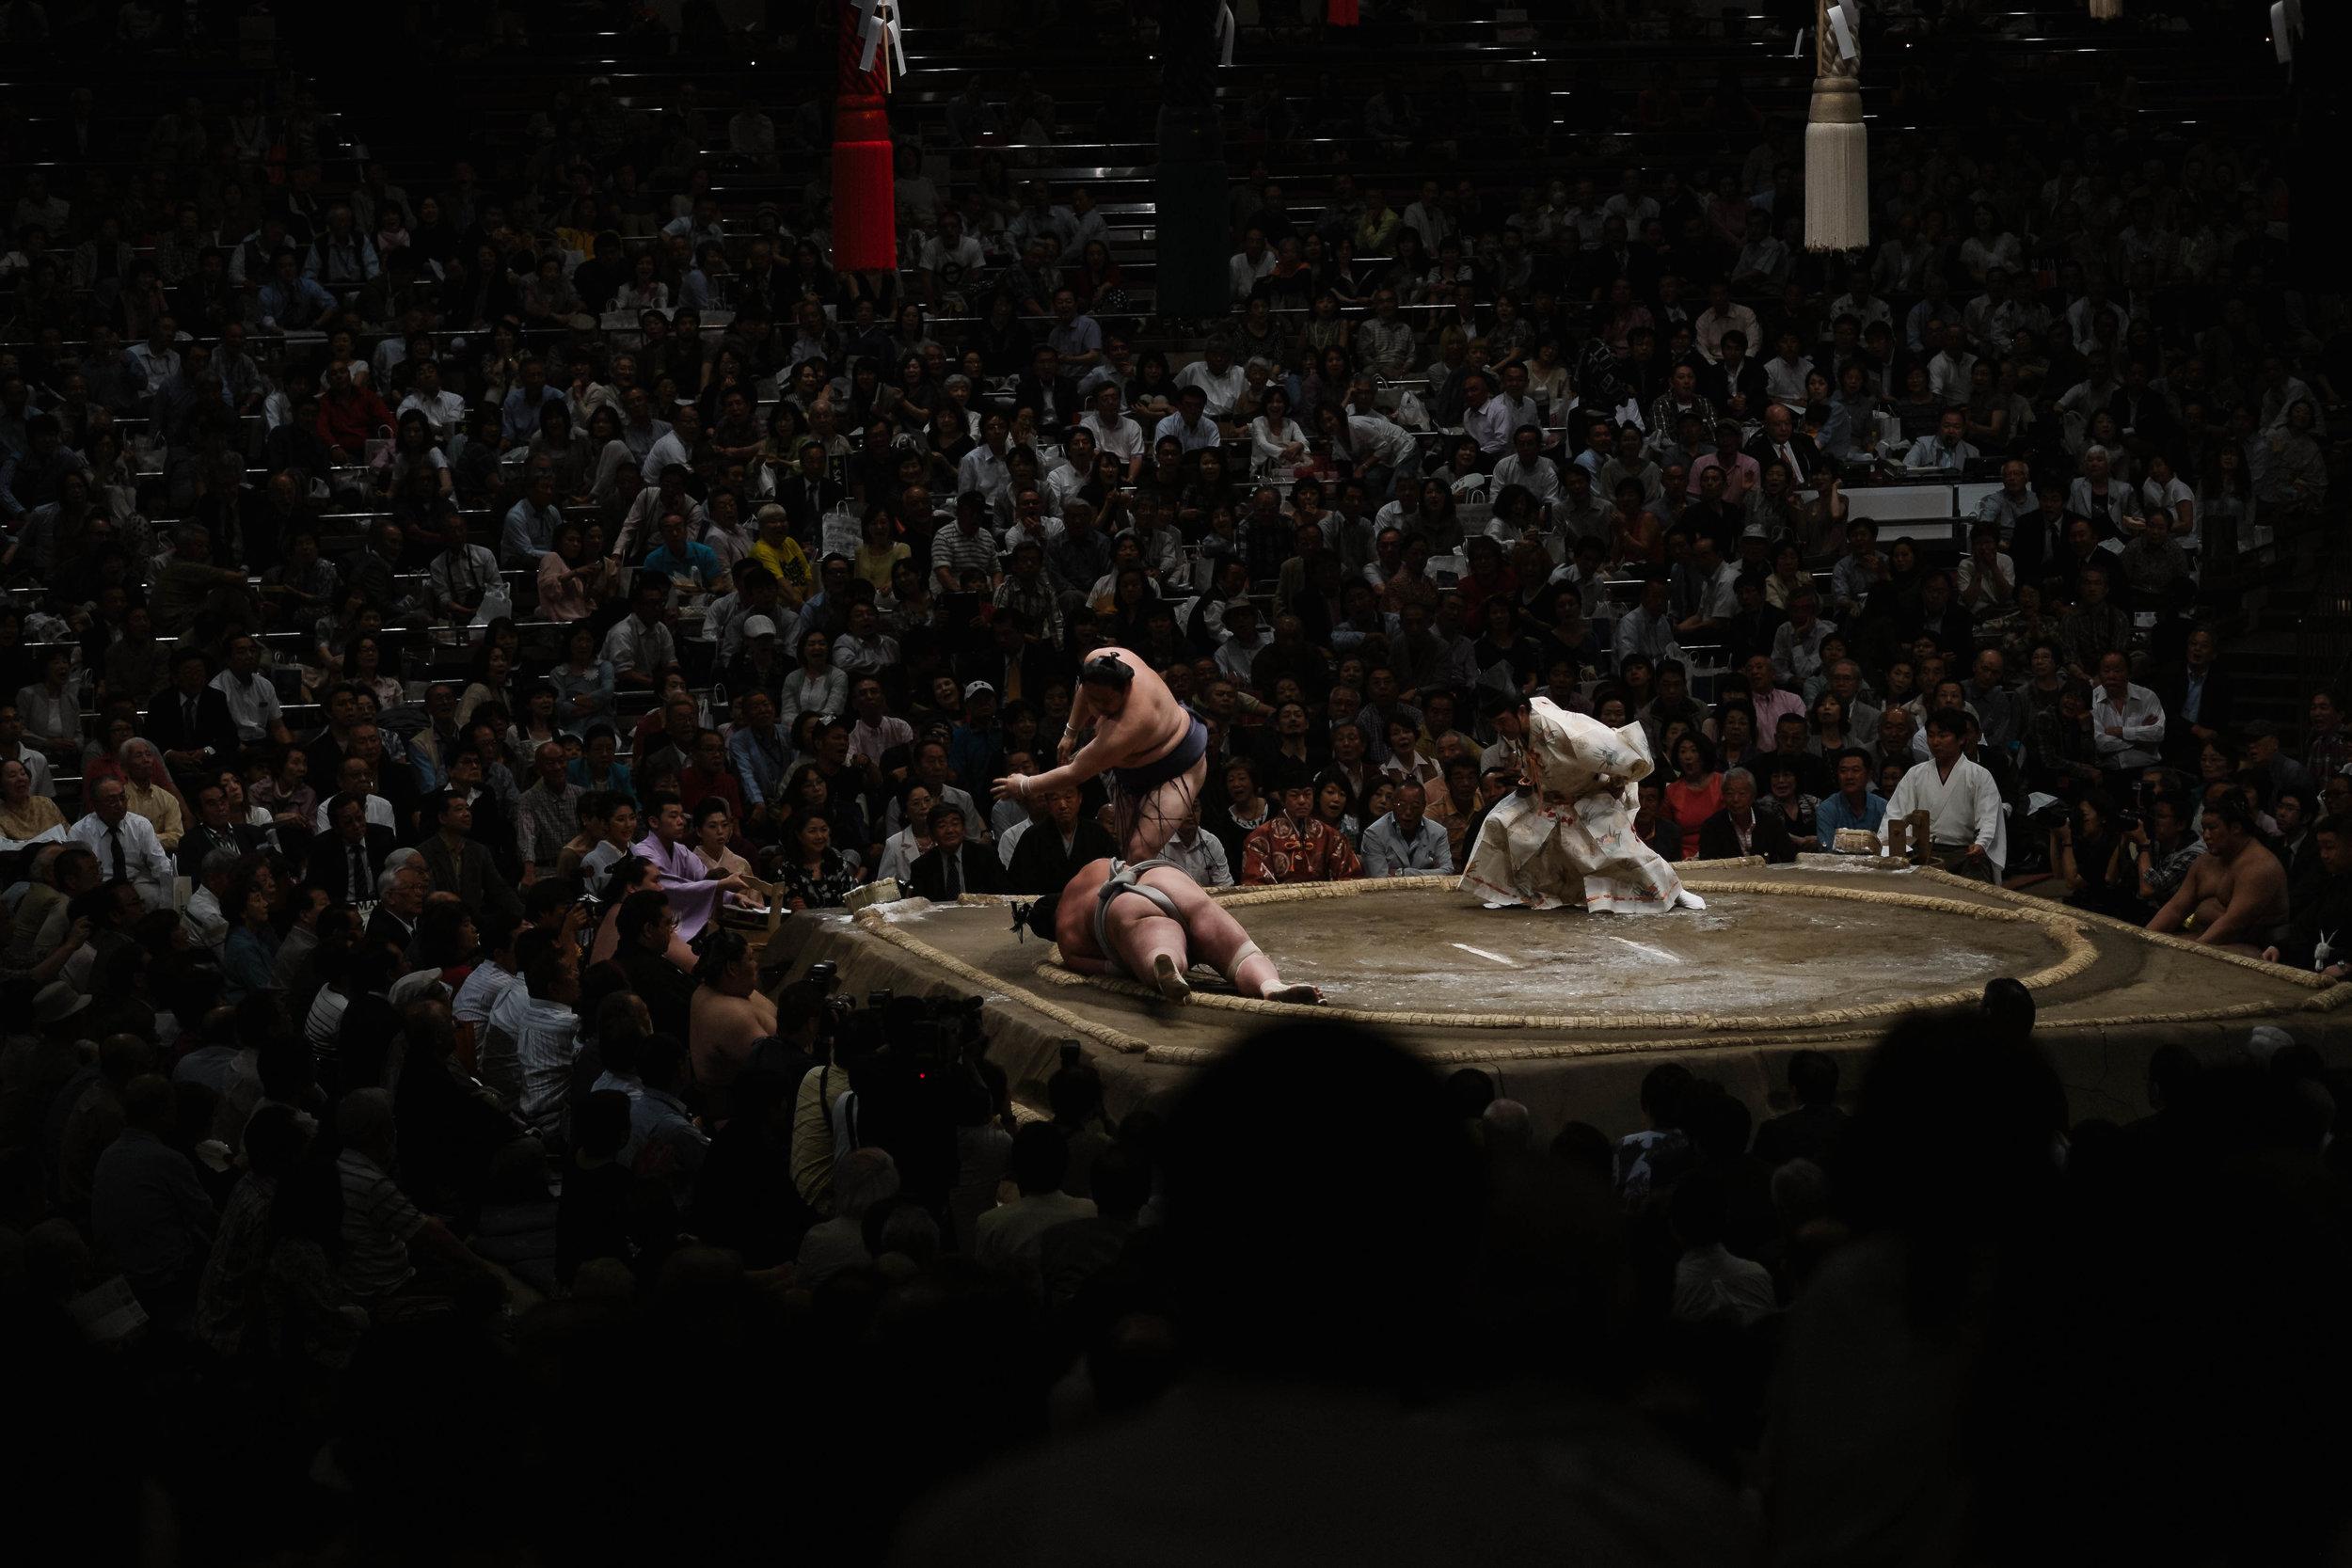 Down he goes, Sumo tournament, Tokyo.